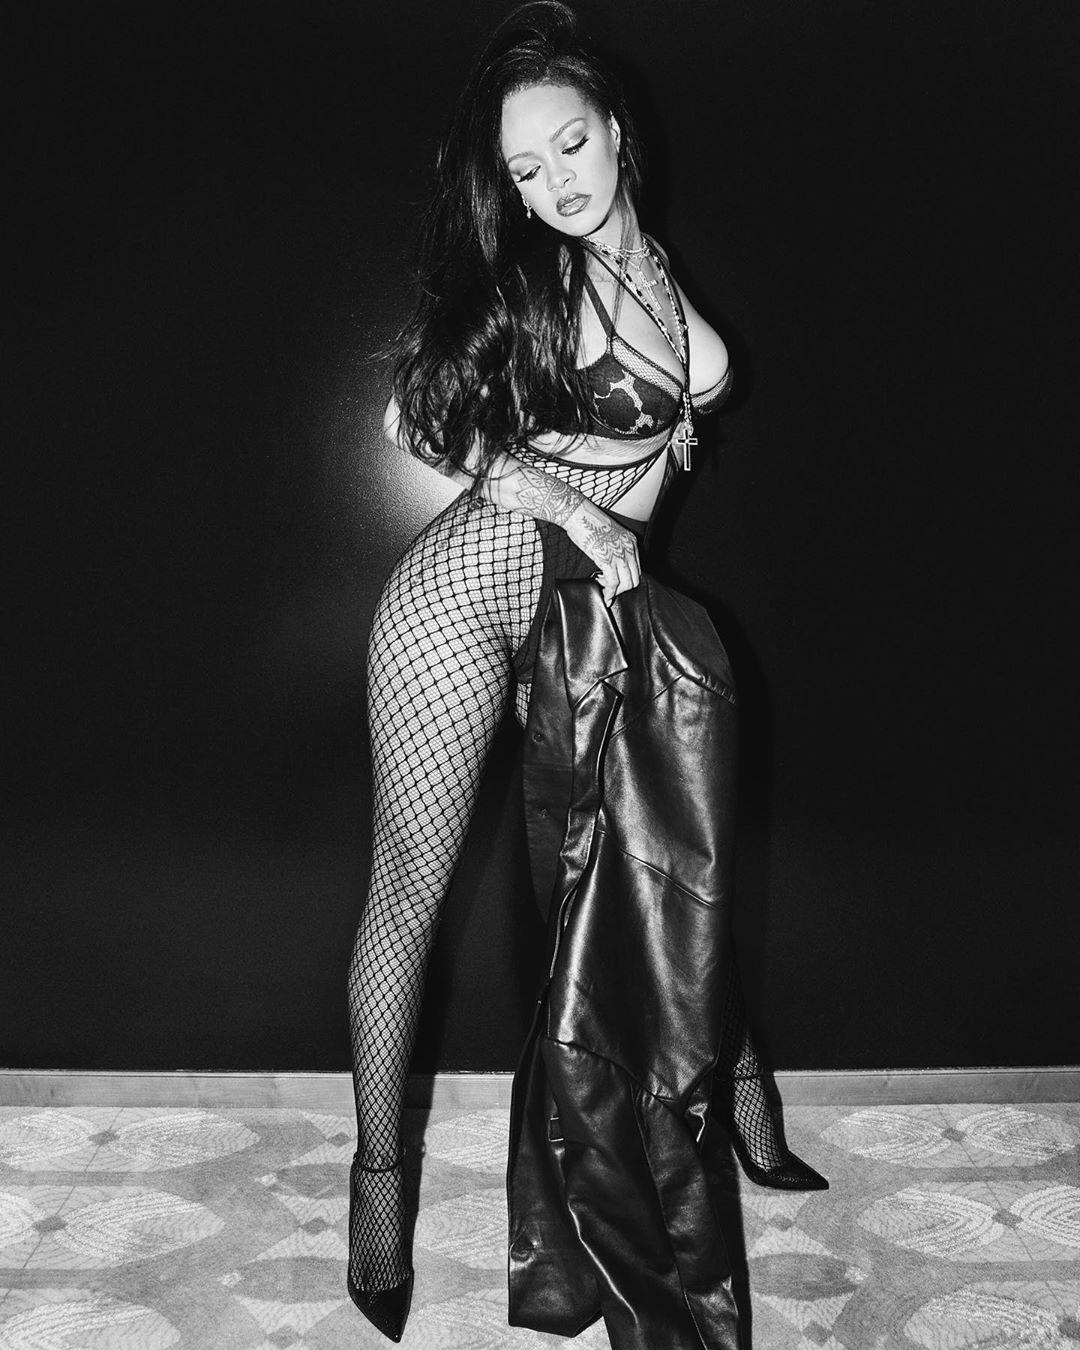 Rihanna looking sexy